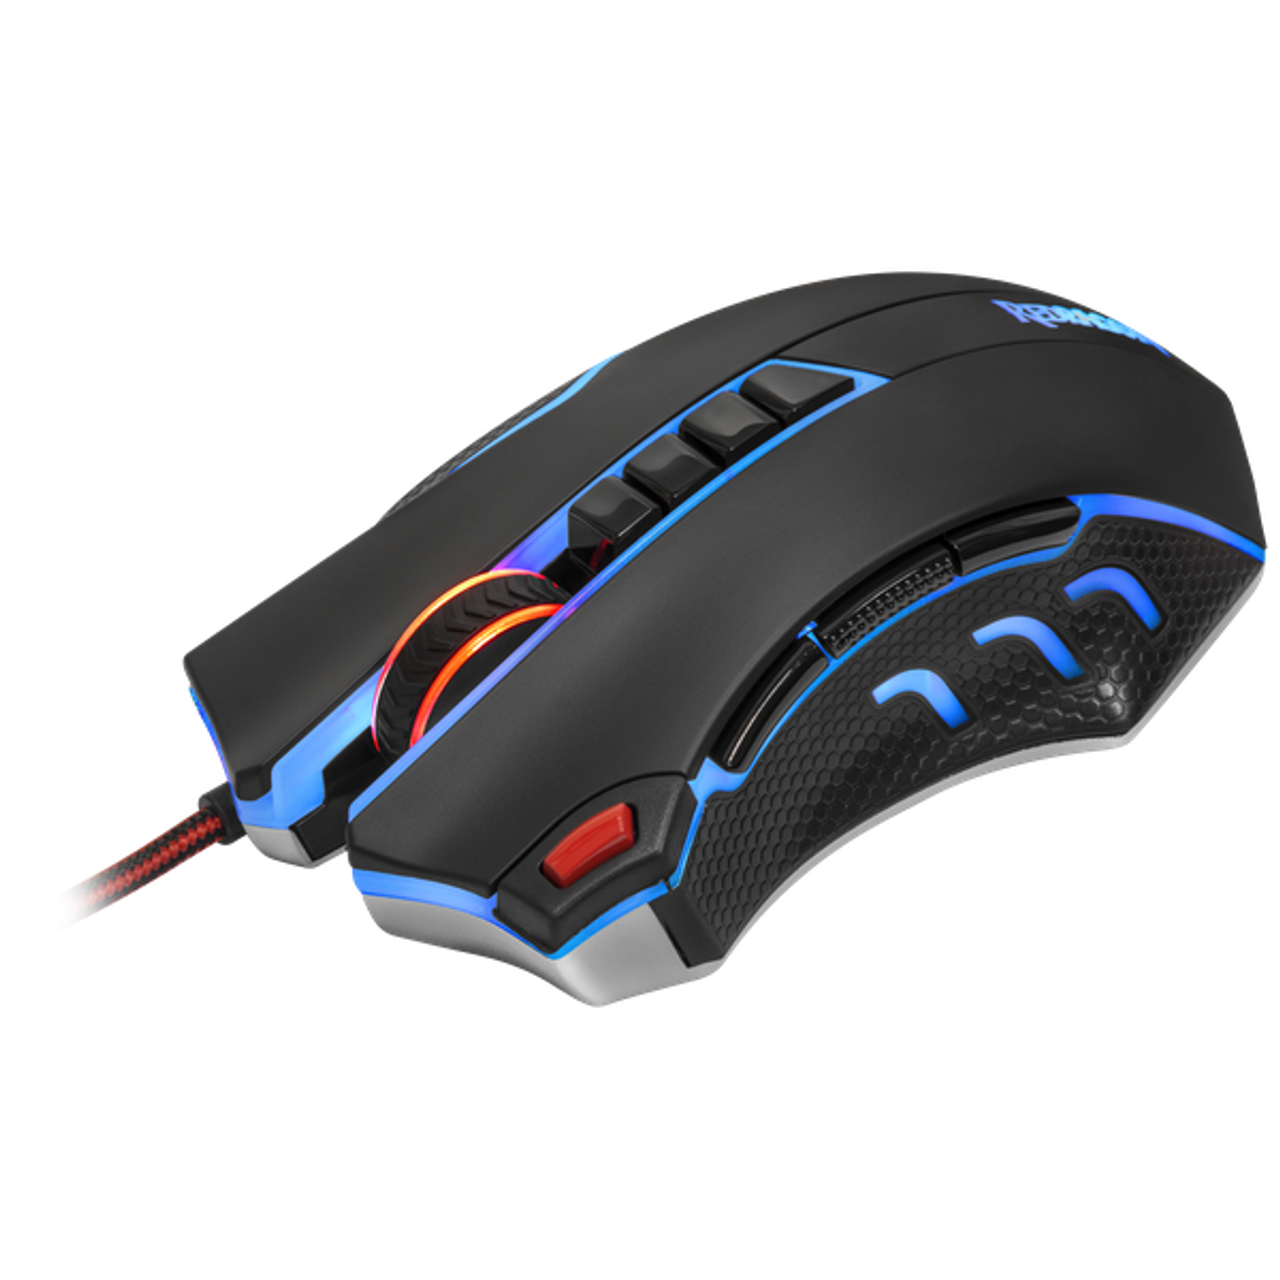 Redragon TIANOBOA 2 M802-RGB Gaming Mouse